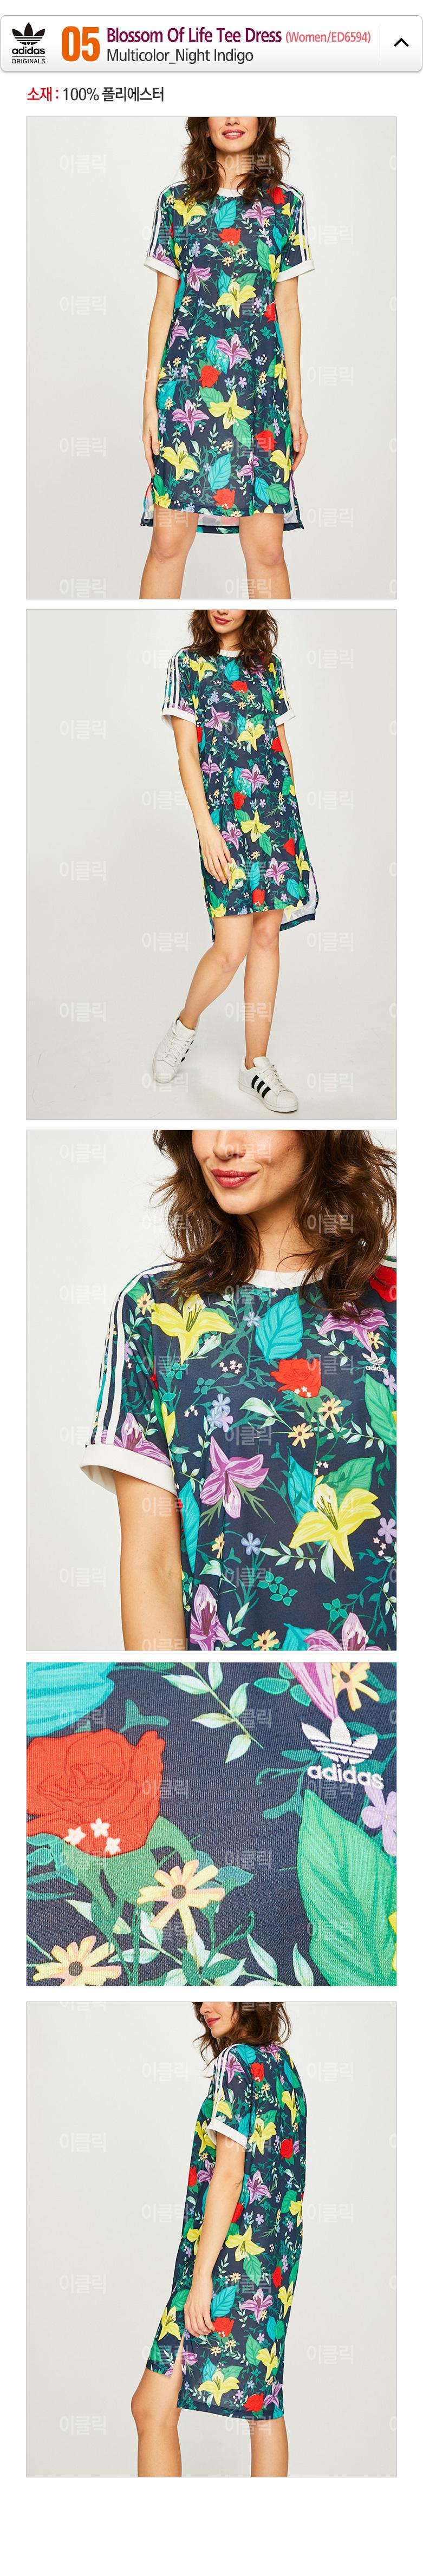 65 Adidas Original Trefoil Short Sleeve Tops Dresses Long